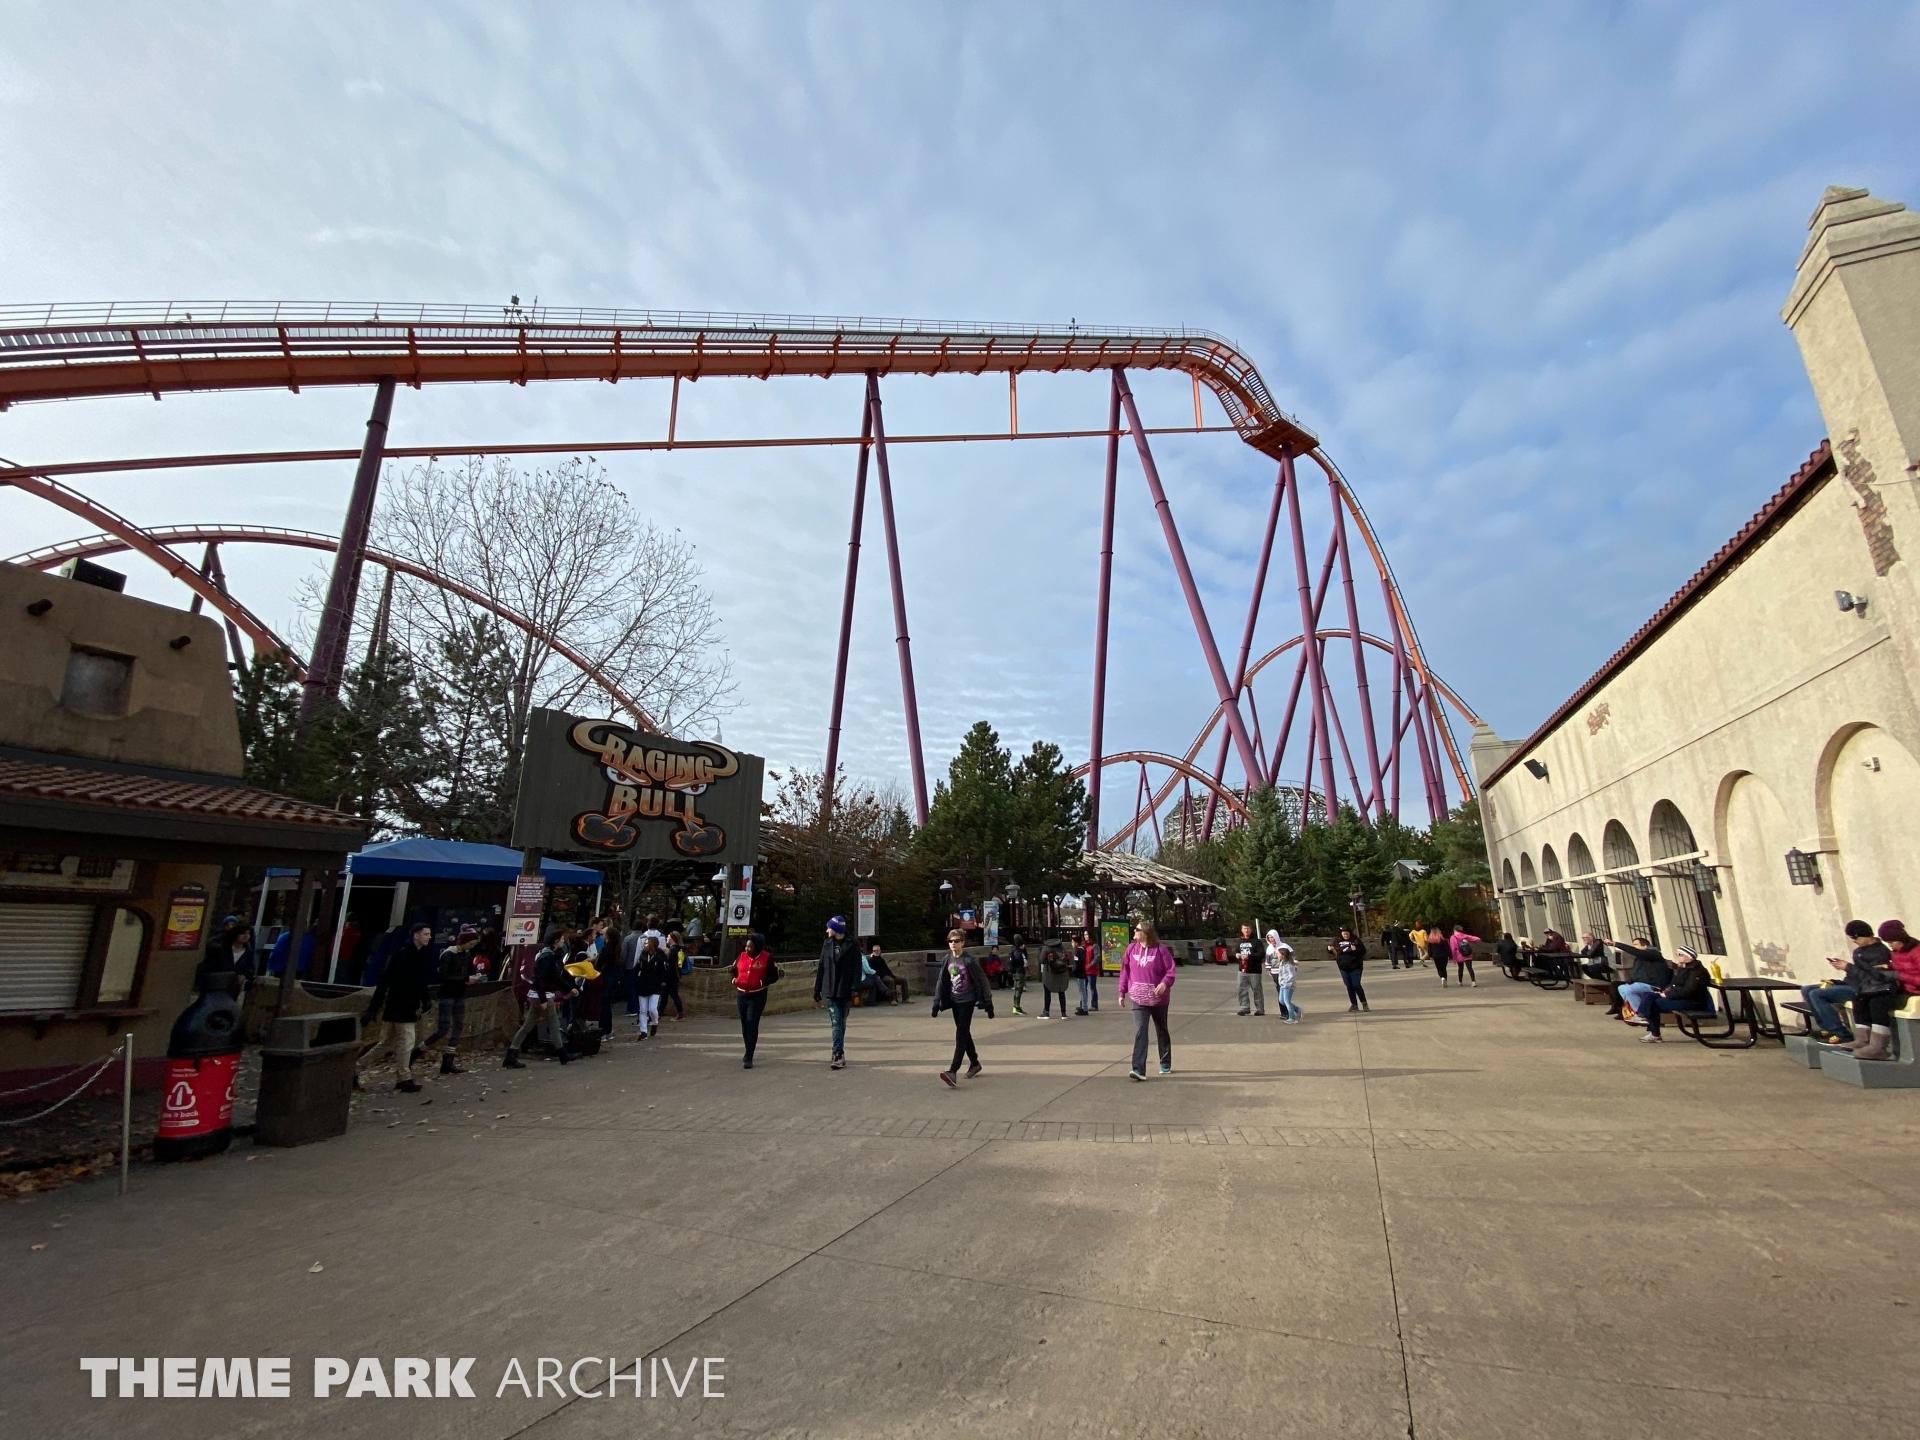 Raging Bull at Six Flags Great America